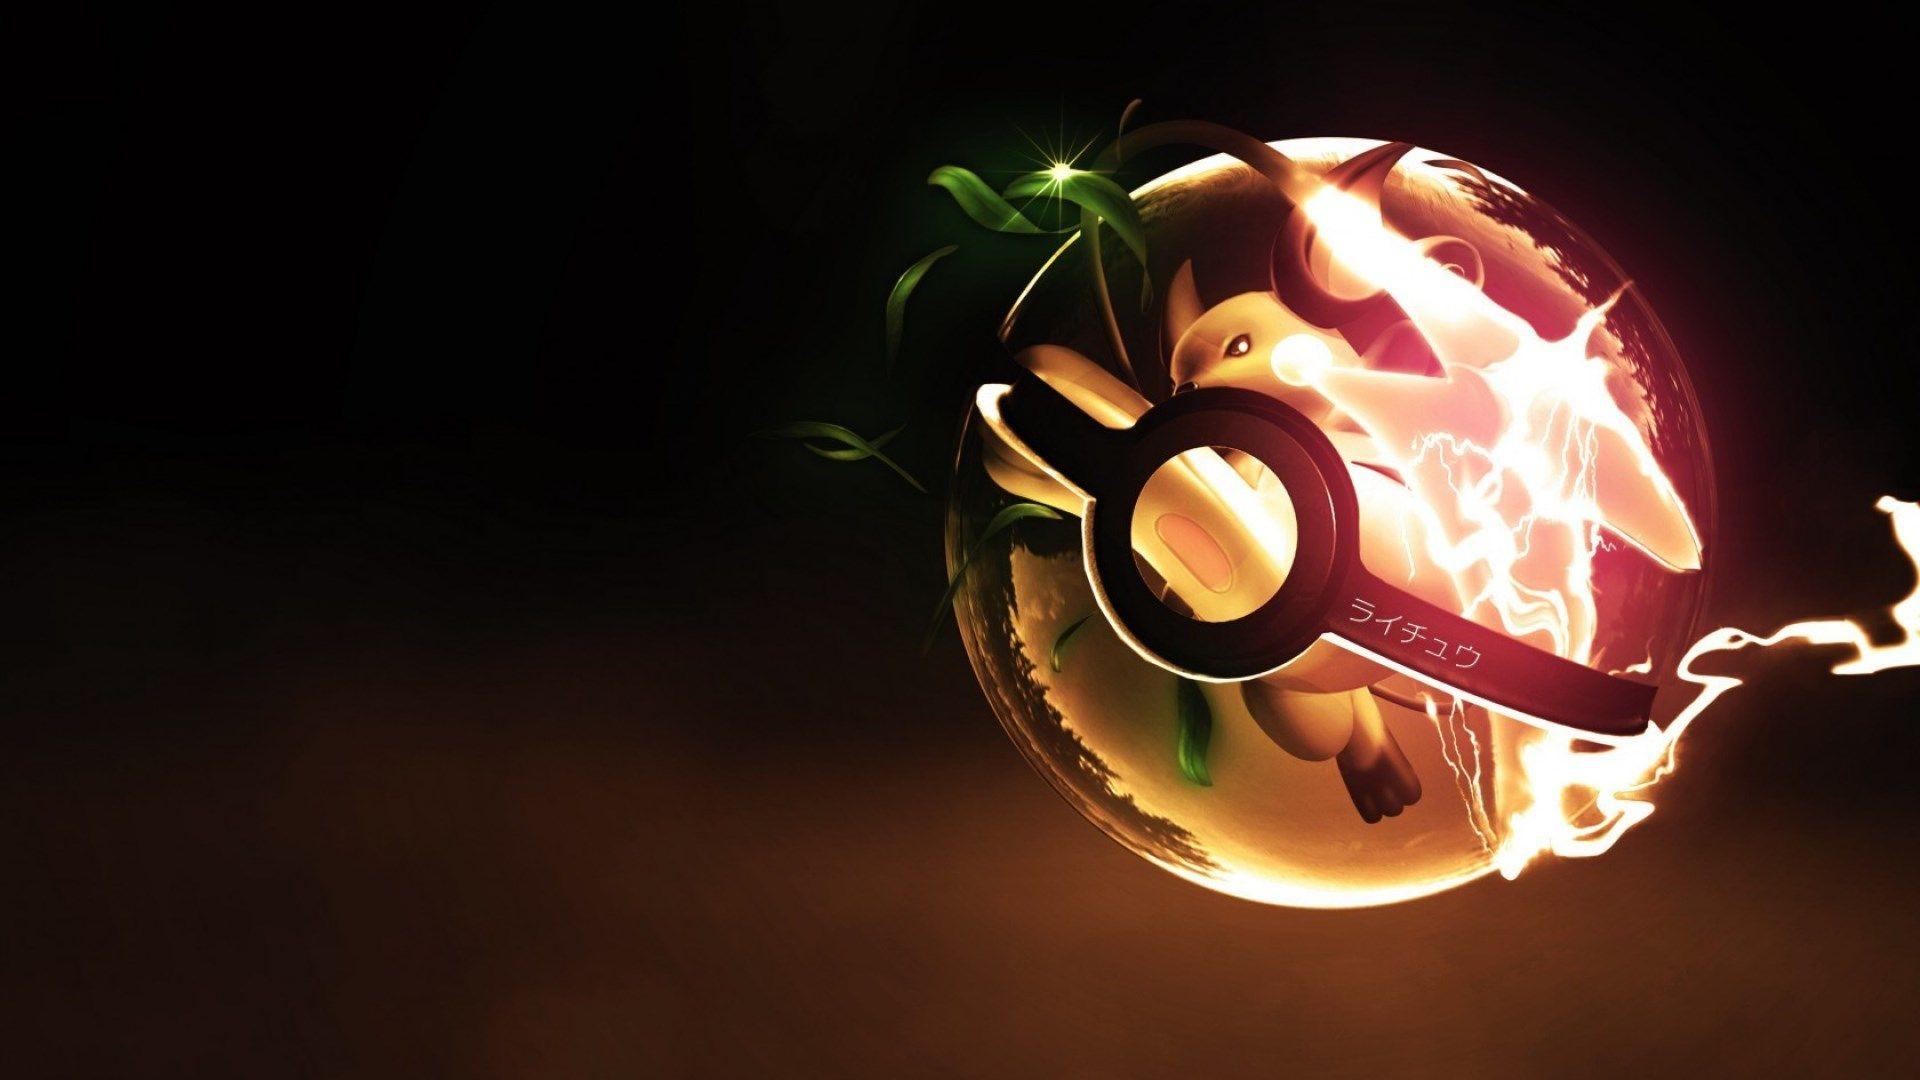 Pokemon Desktop Wallpaper Hd Wallpapers Imágenes De Fondo